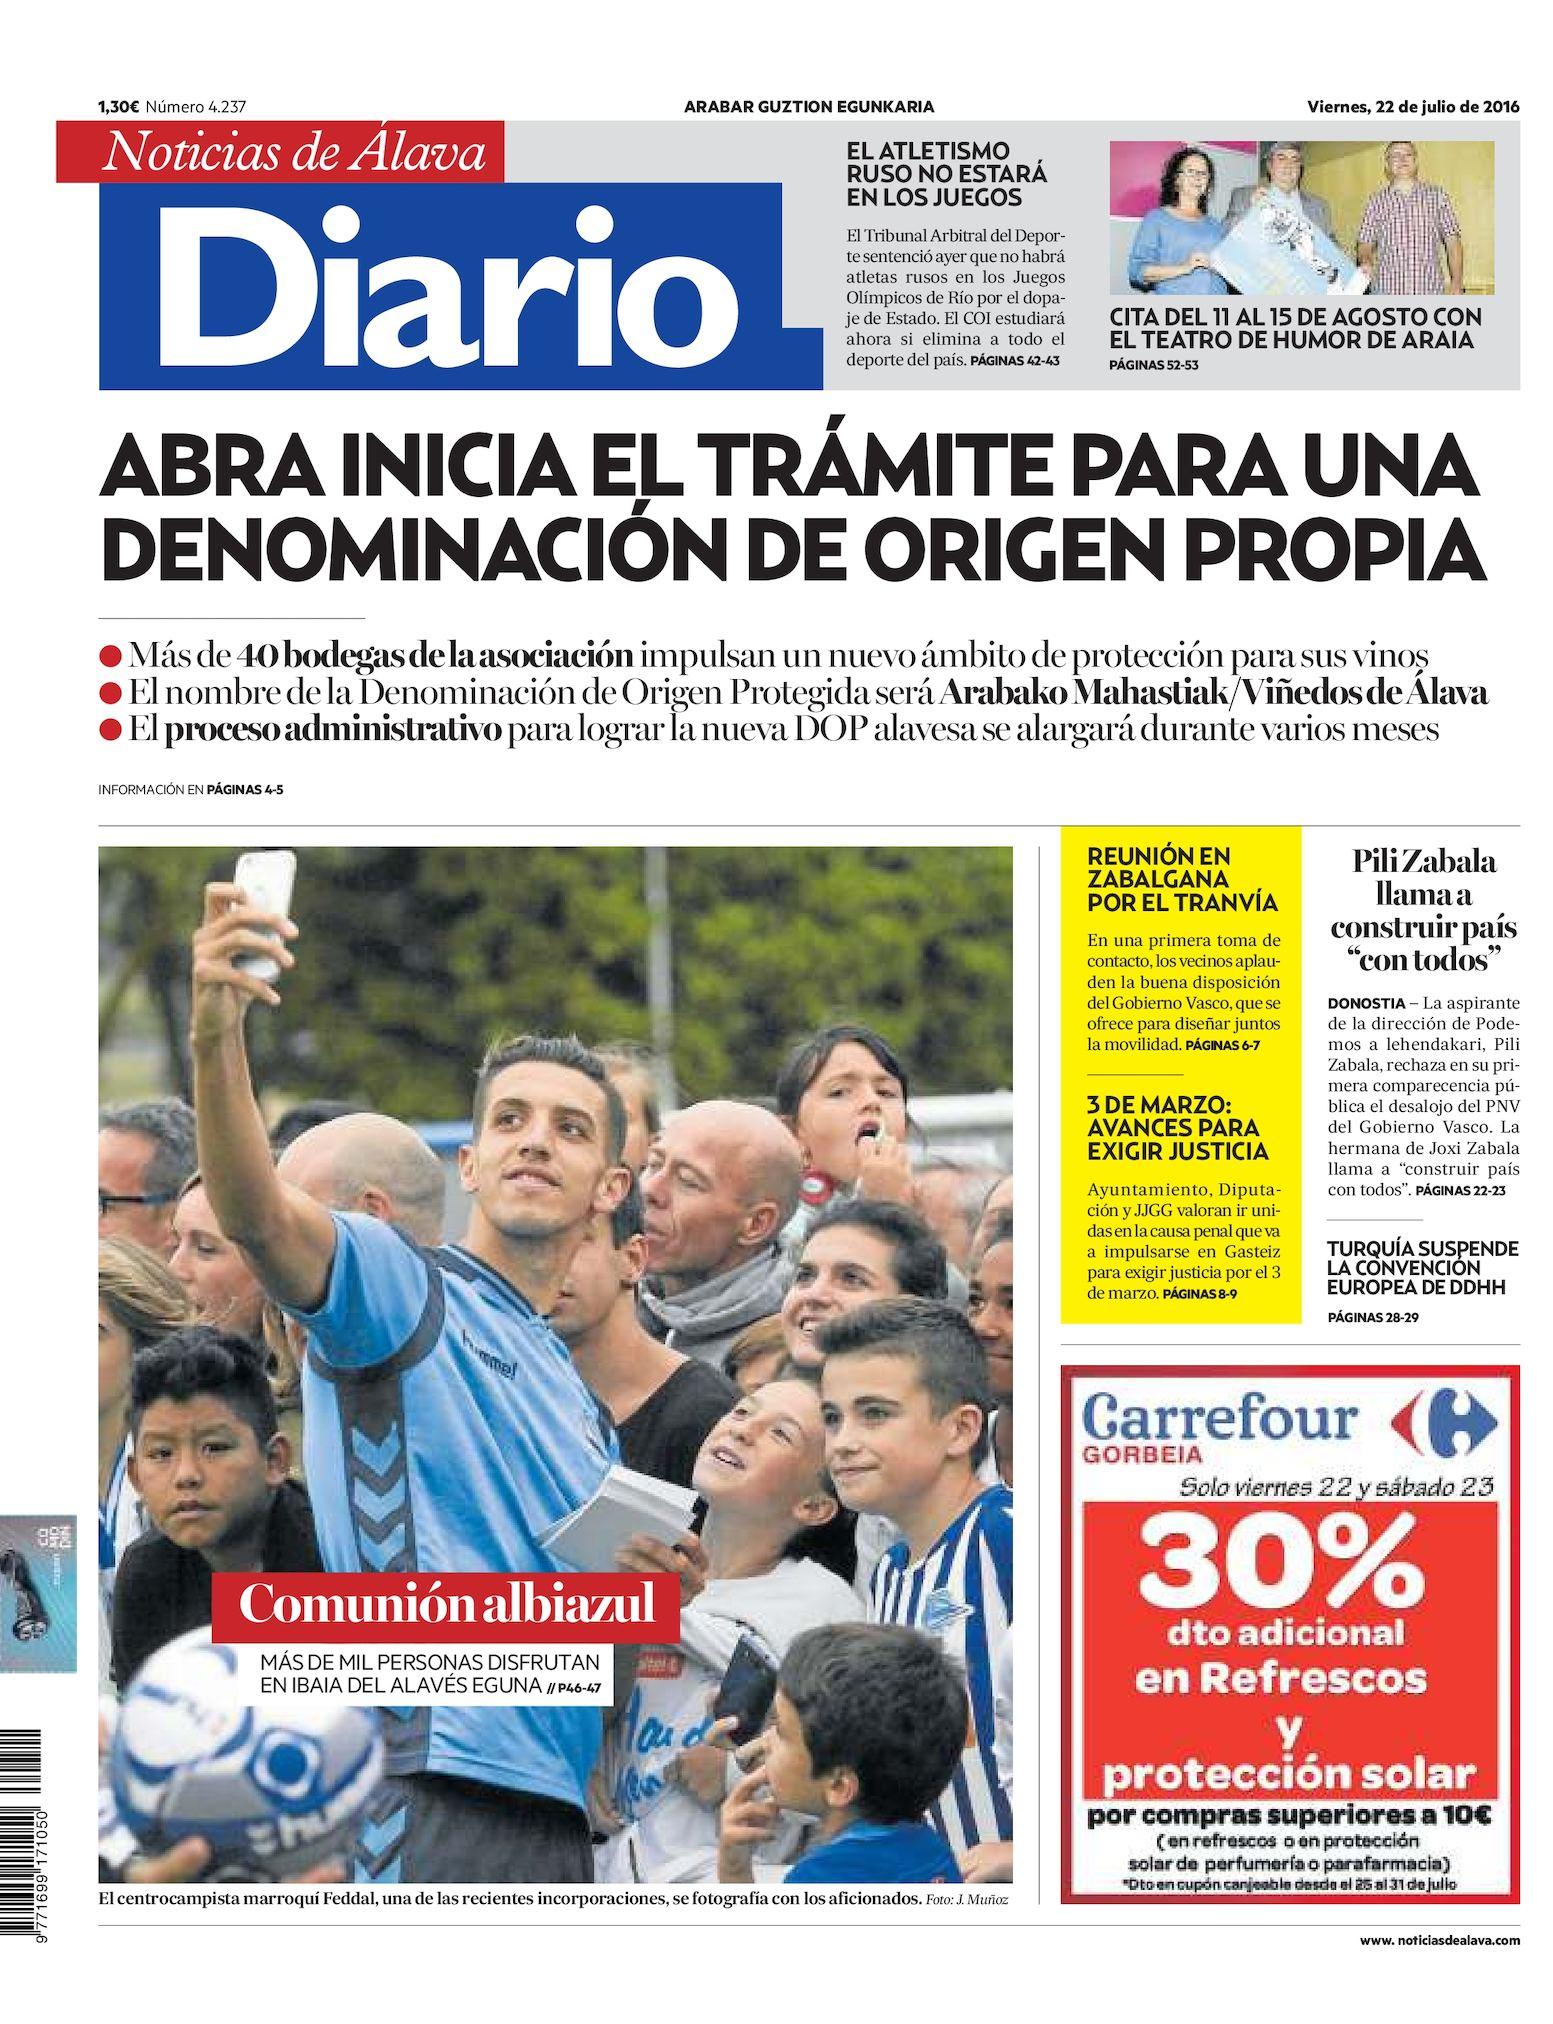 Diario Álava Calaméo De 20160722 Noticias 08wPOnk